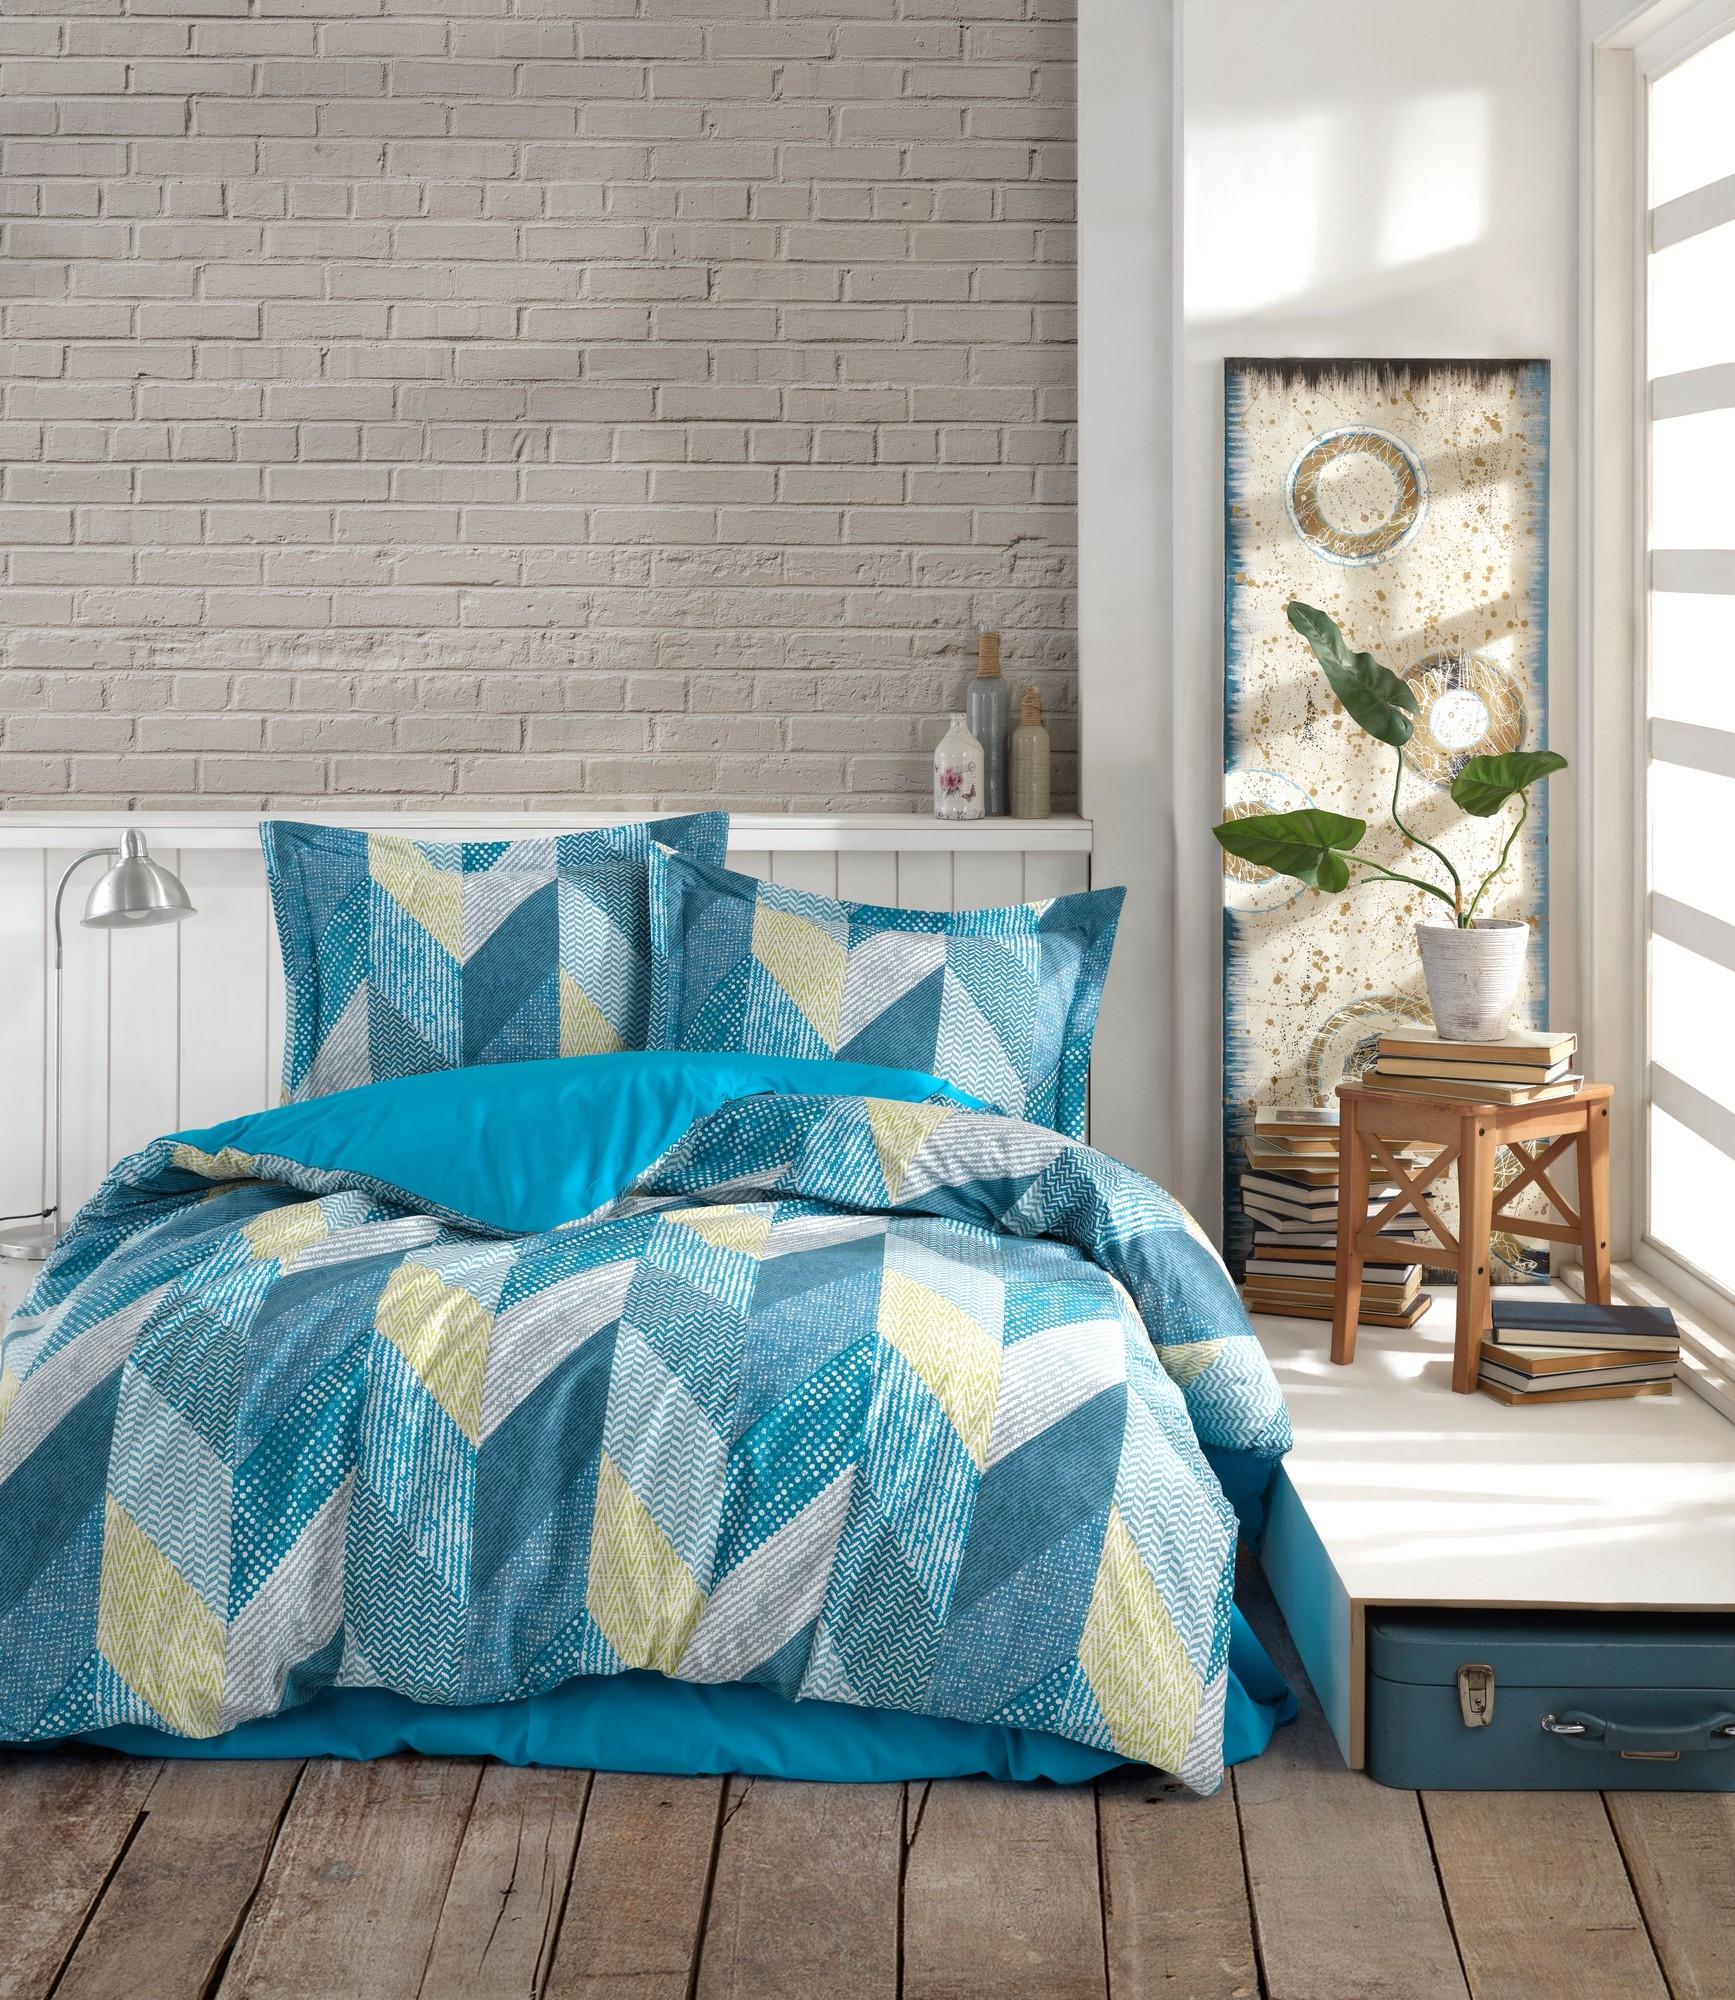 Lenjerie de pat din bumbac Ranforce, Anatolia Albastru / Alb, 200 x 220 cm imagine